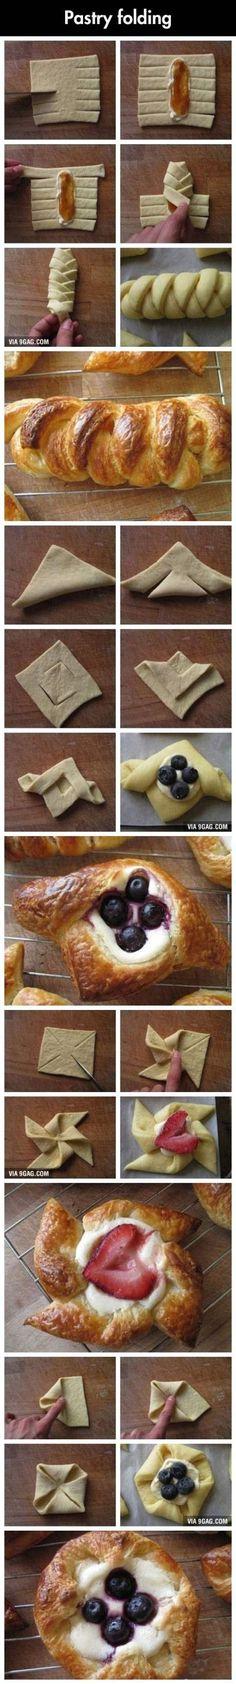 Pastry Folding Ideas